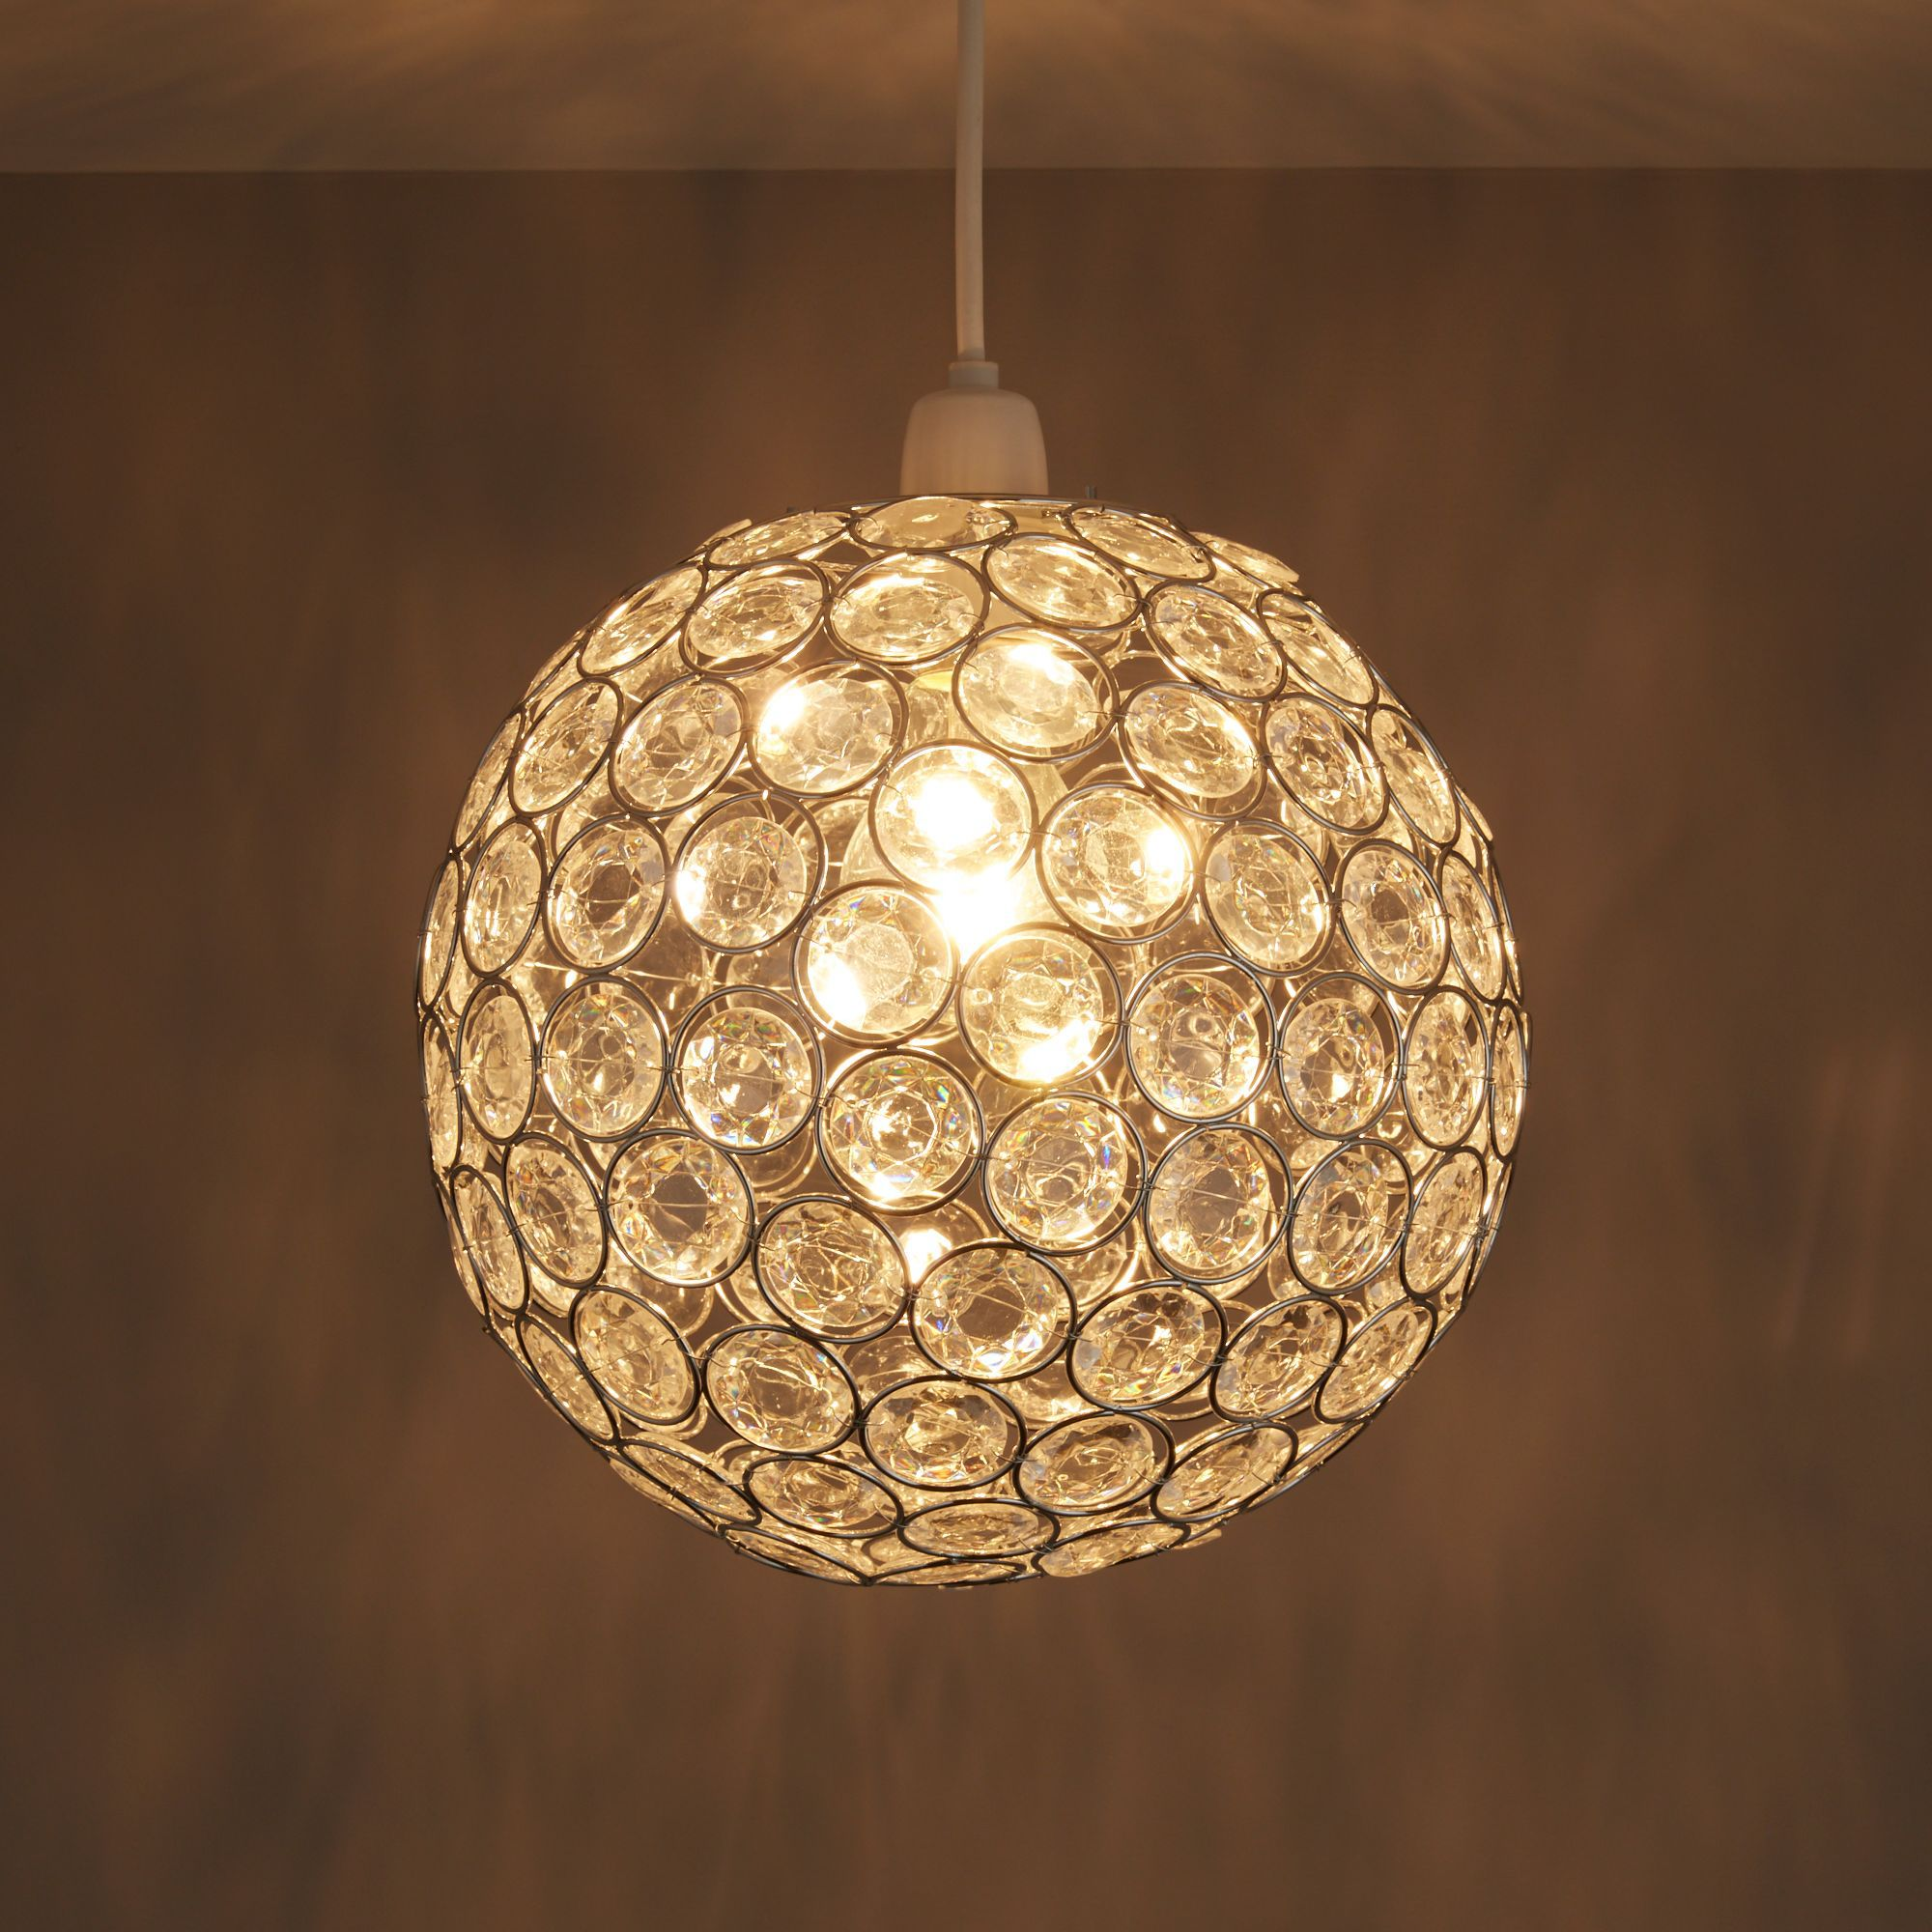 Diy at bq zoe clear crystal effect beaded rings pendant light shade d240mm aloadofball Choice Image